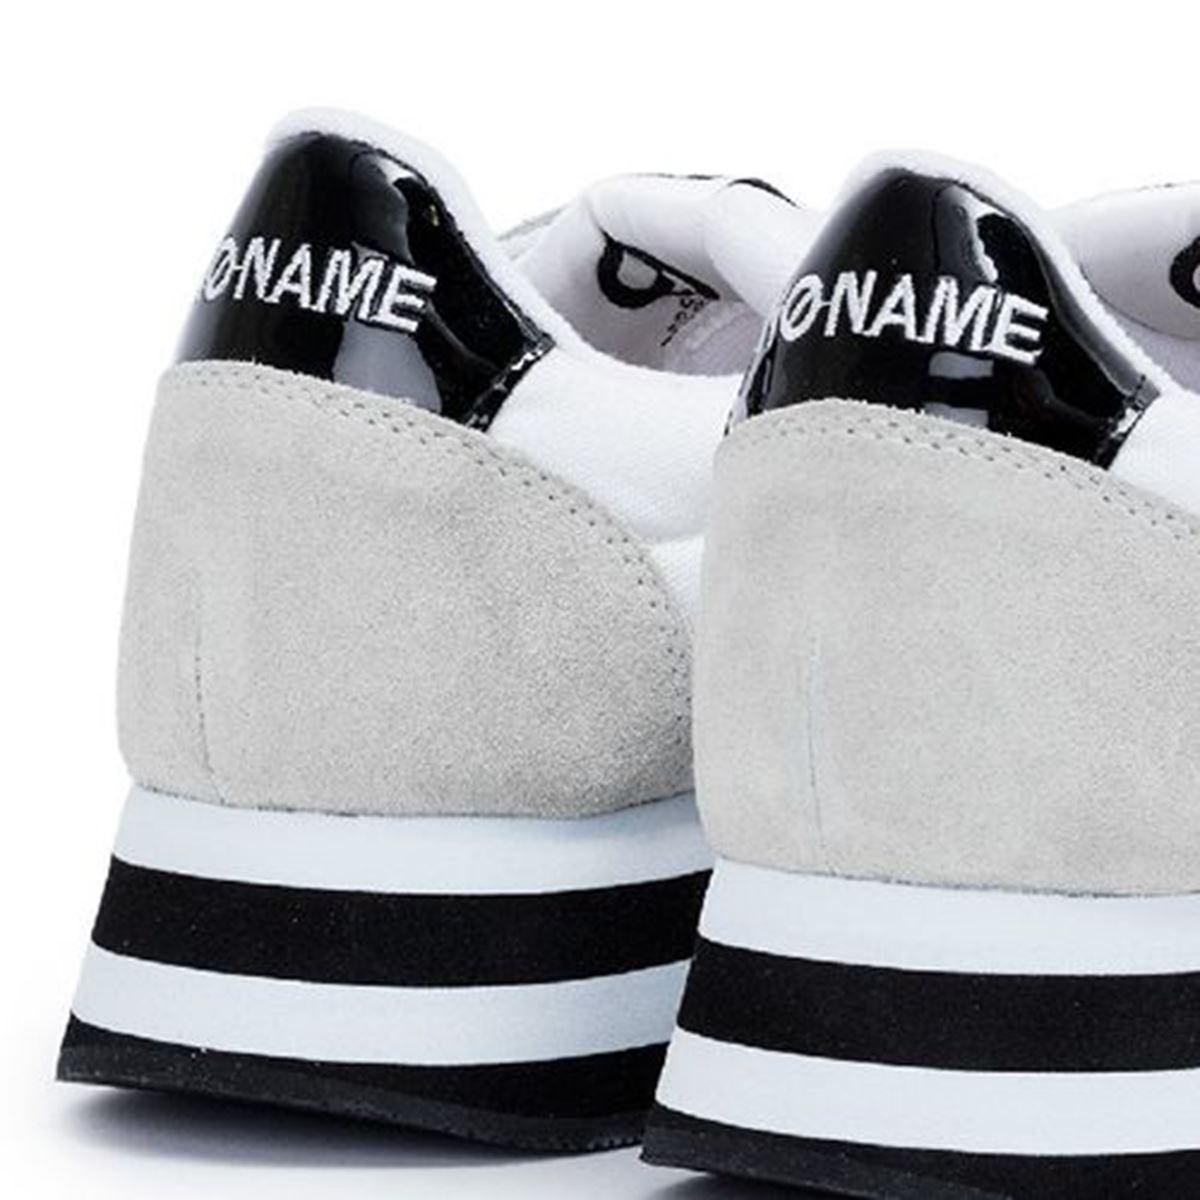 NO NAME ノーネーム フレックス ホワイト FLEX-02101